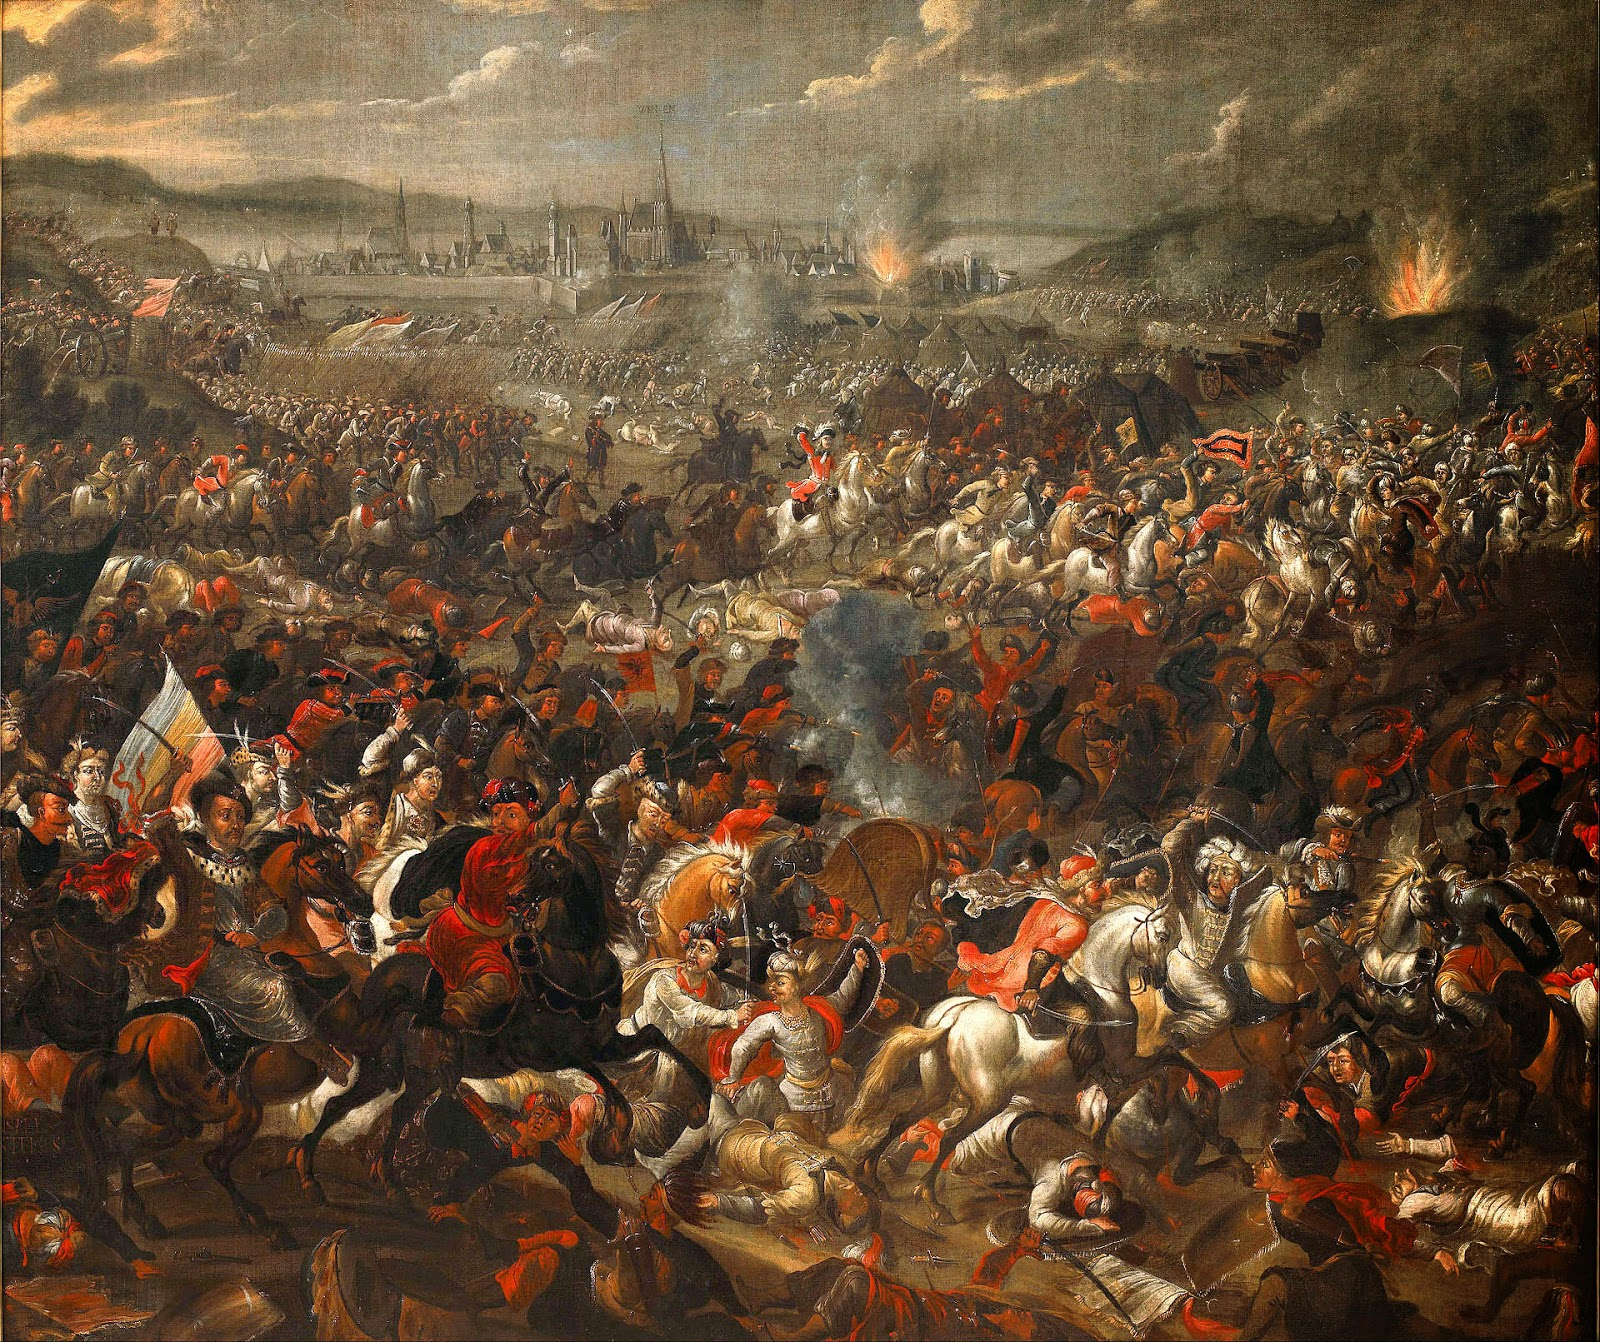 The Battle of Vienna, September 11, 1683